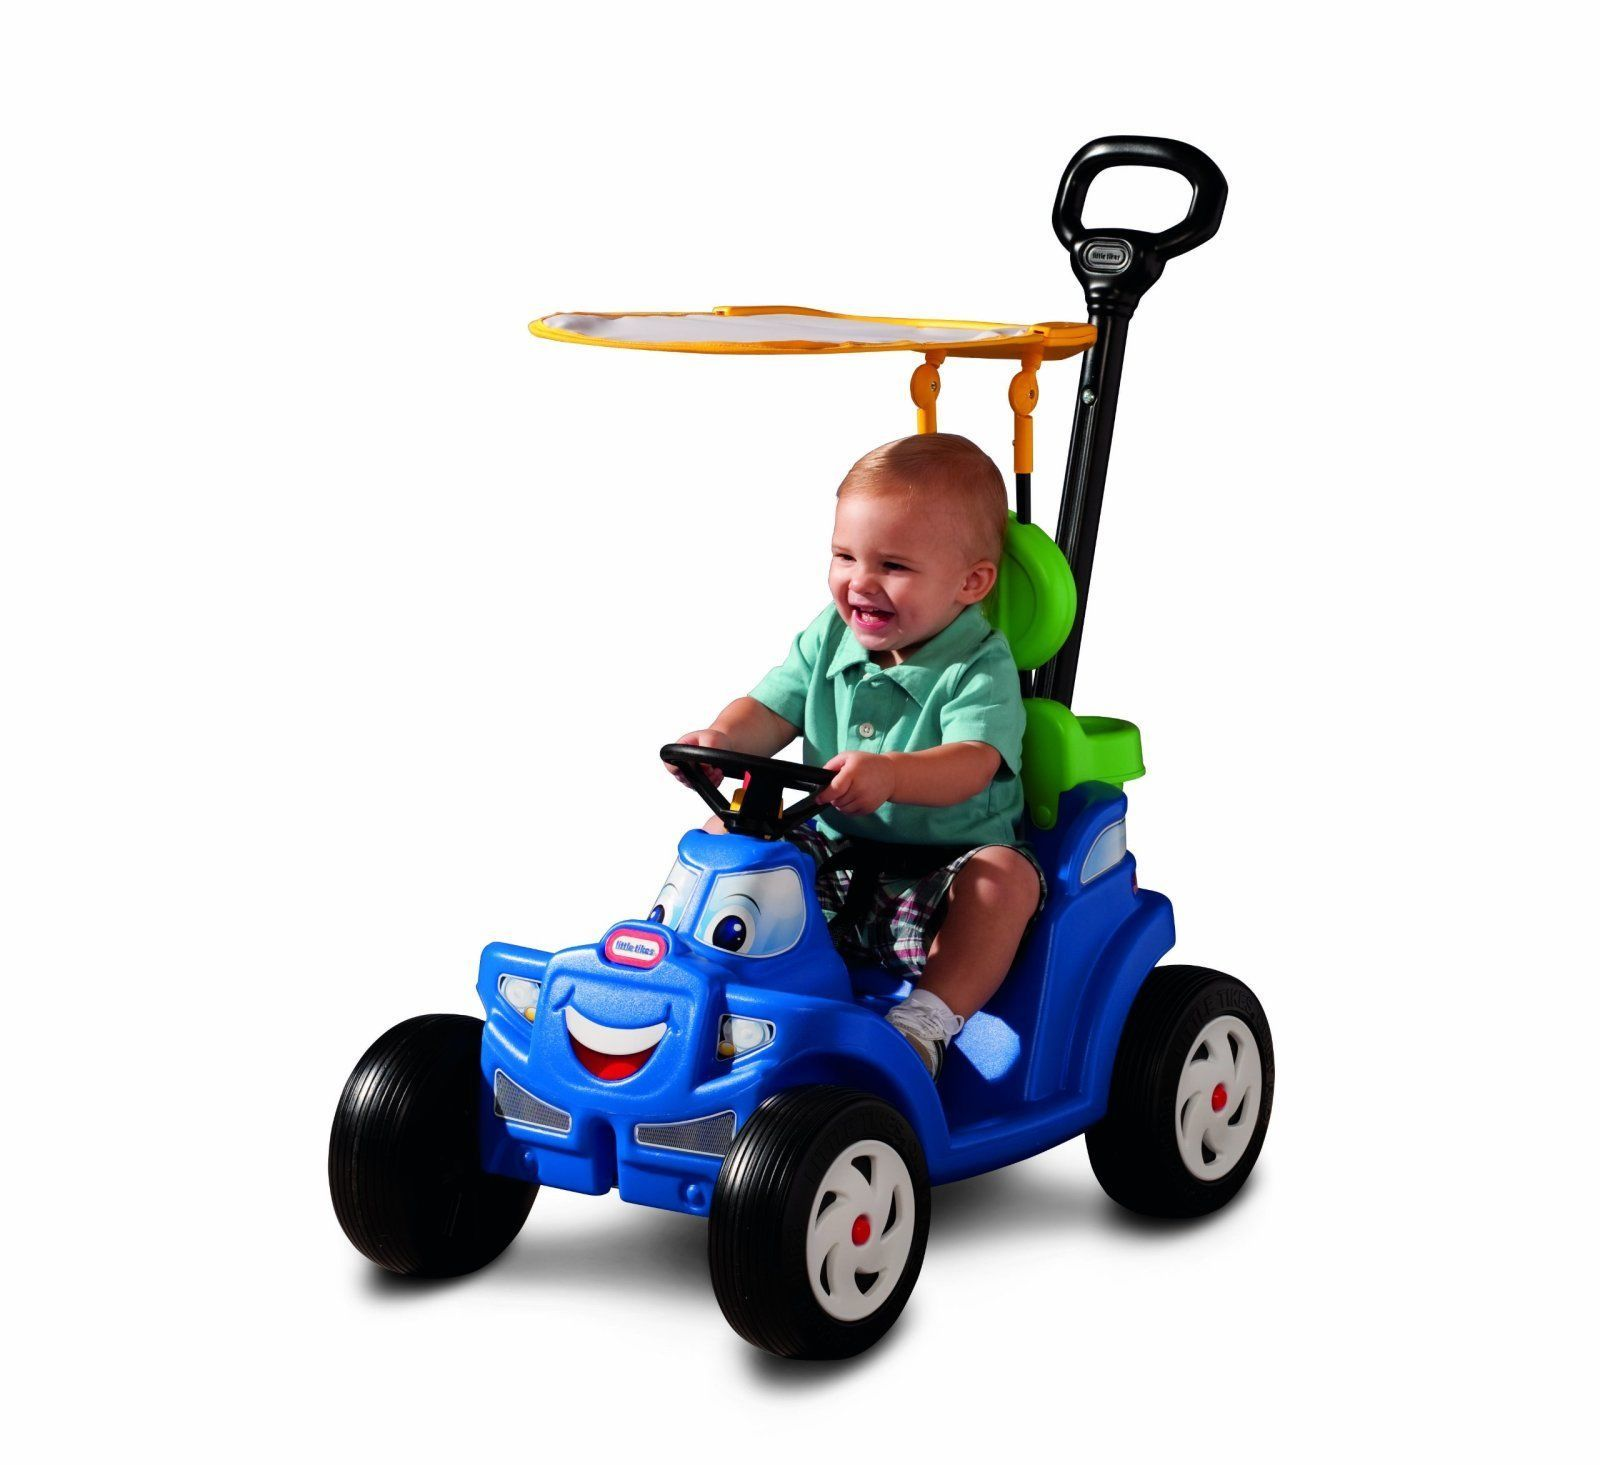 2 in 1 Cozy Roadster Baby Stroller Kids Ride Toy Car Tricycle Bike Handle